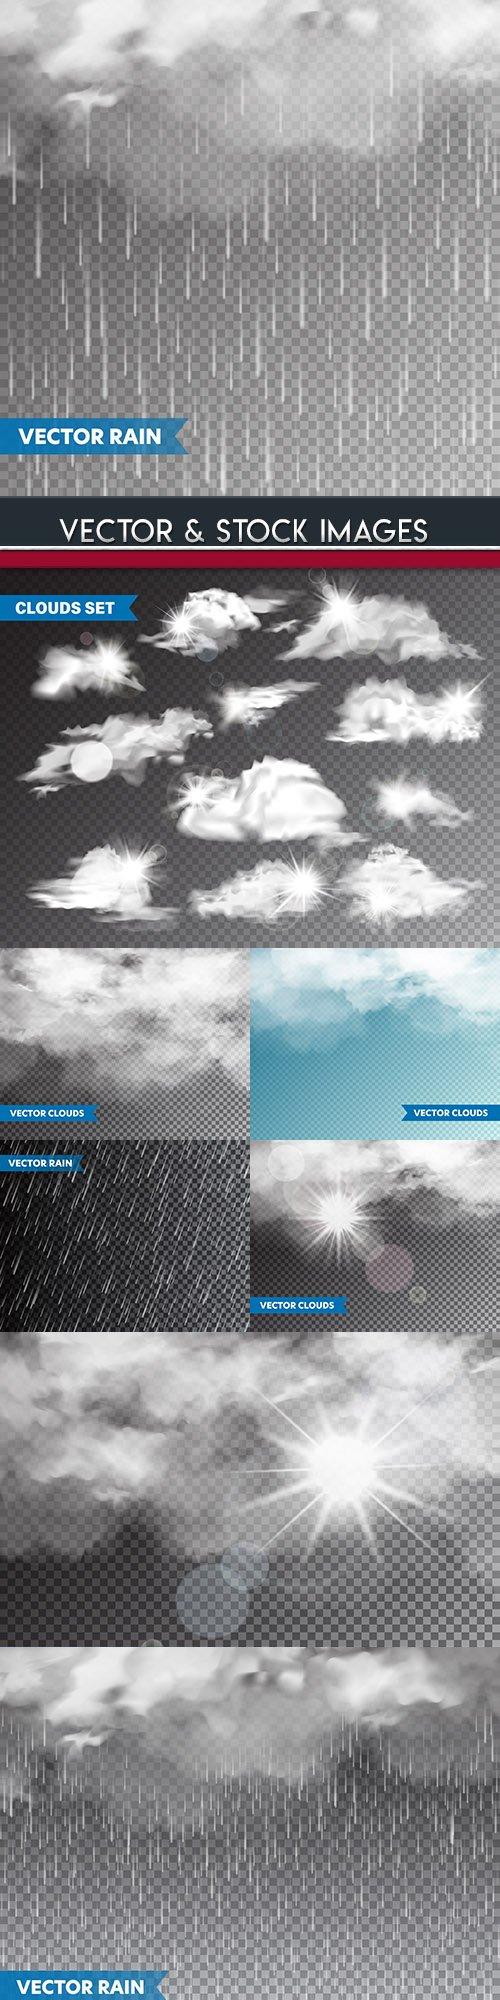 Cloud clouds and rain realistic 3 d illustrations